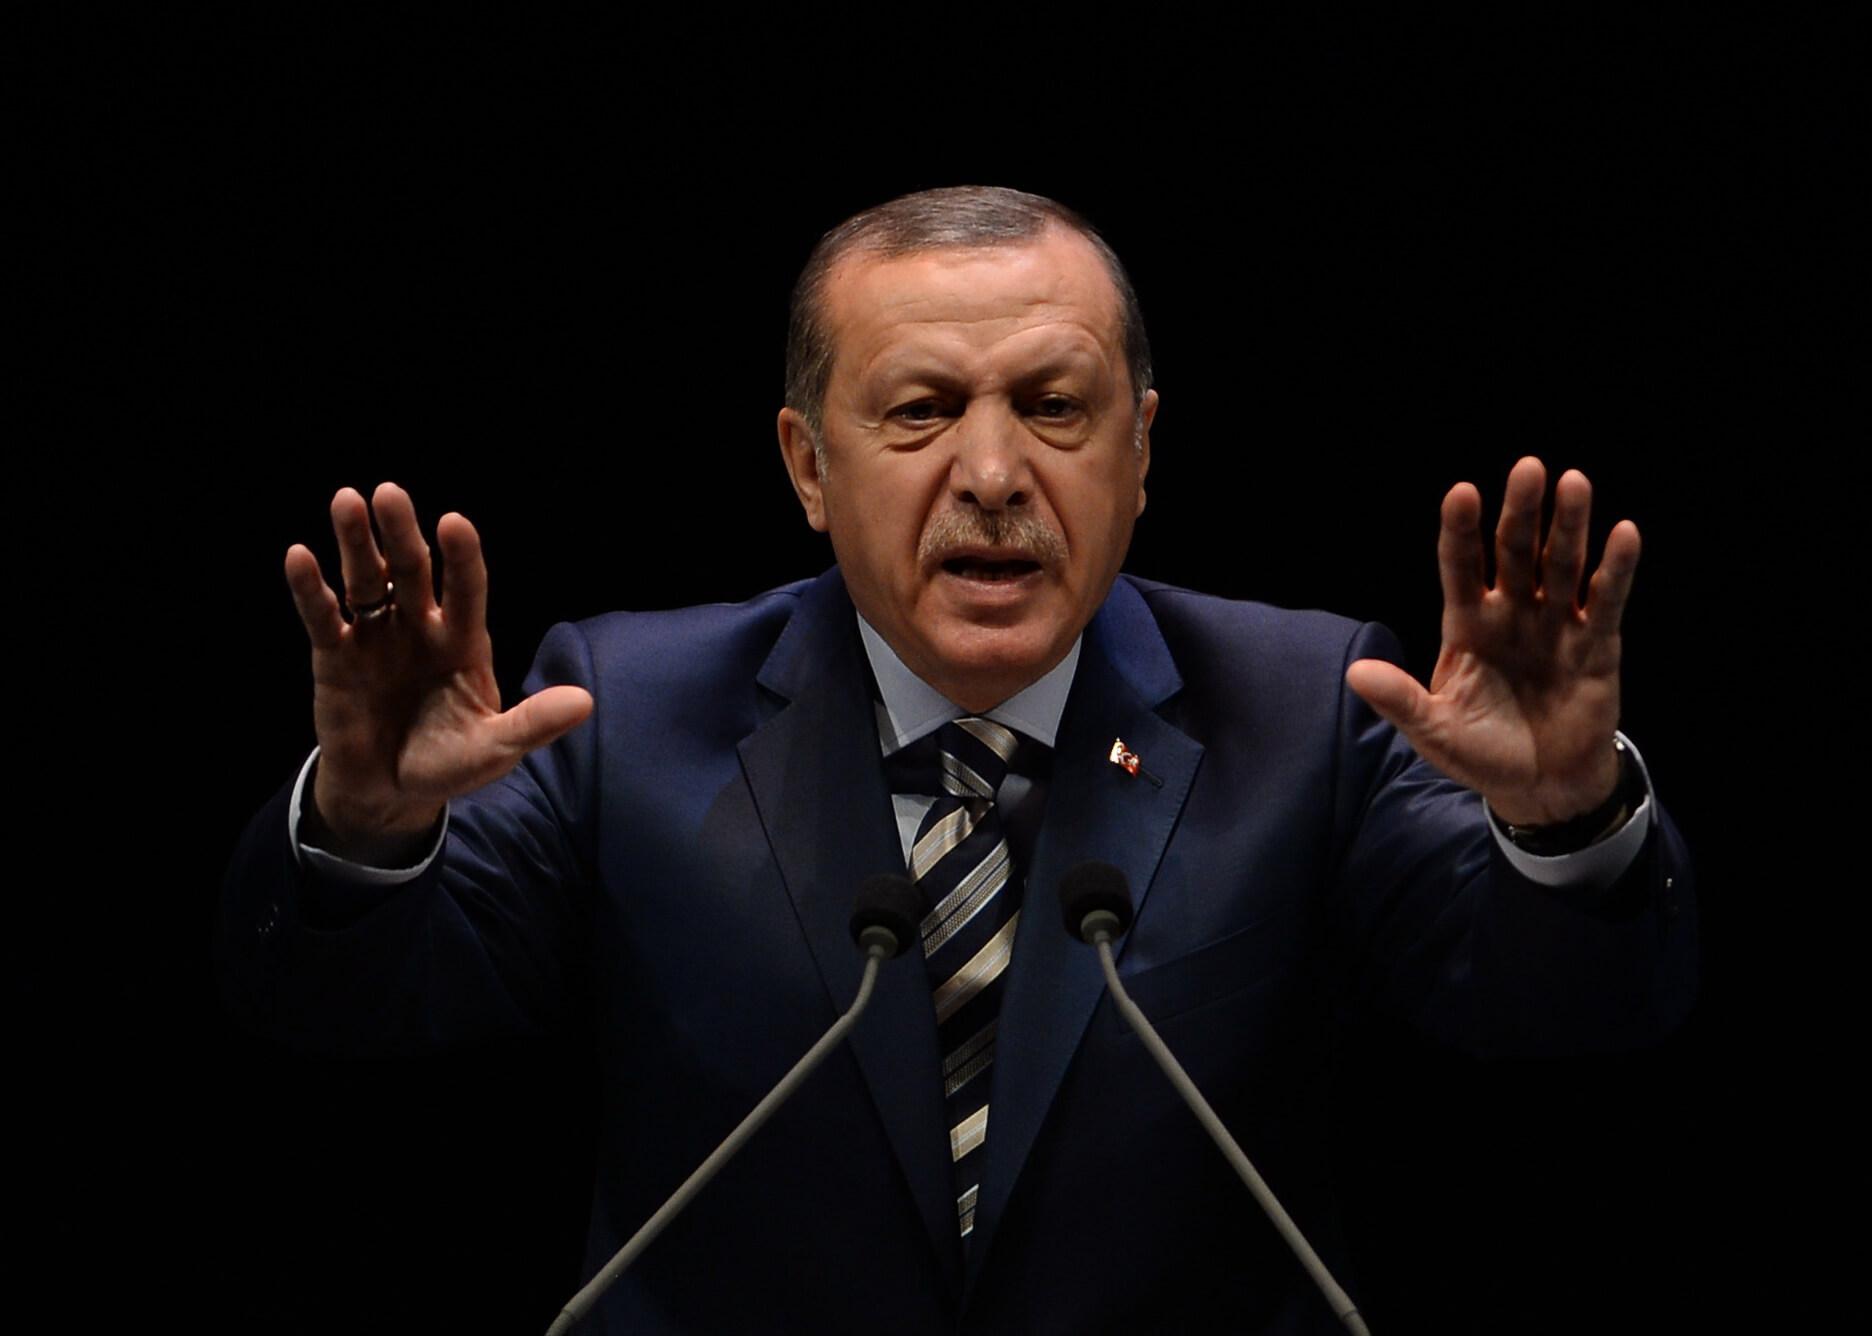 Реджеп Эрдоган. Фото: